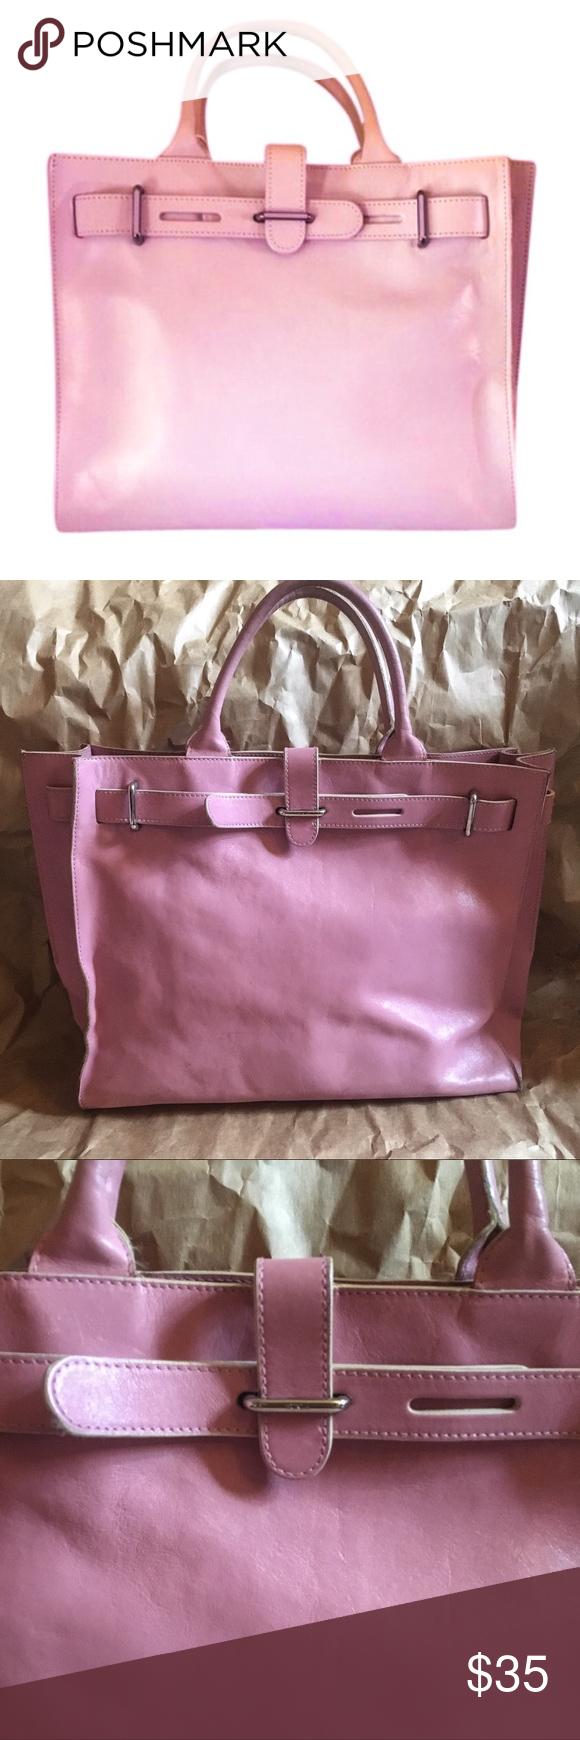 List Of Pinterest Furla Bags Leather Totes Images Agata Pink Greta Birkin Tote Satchel